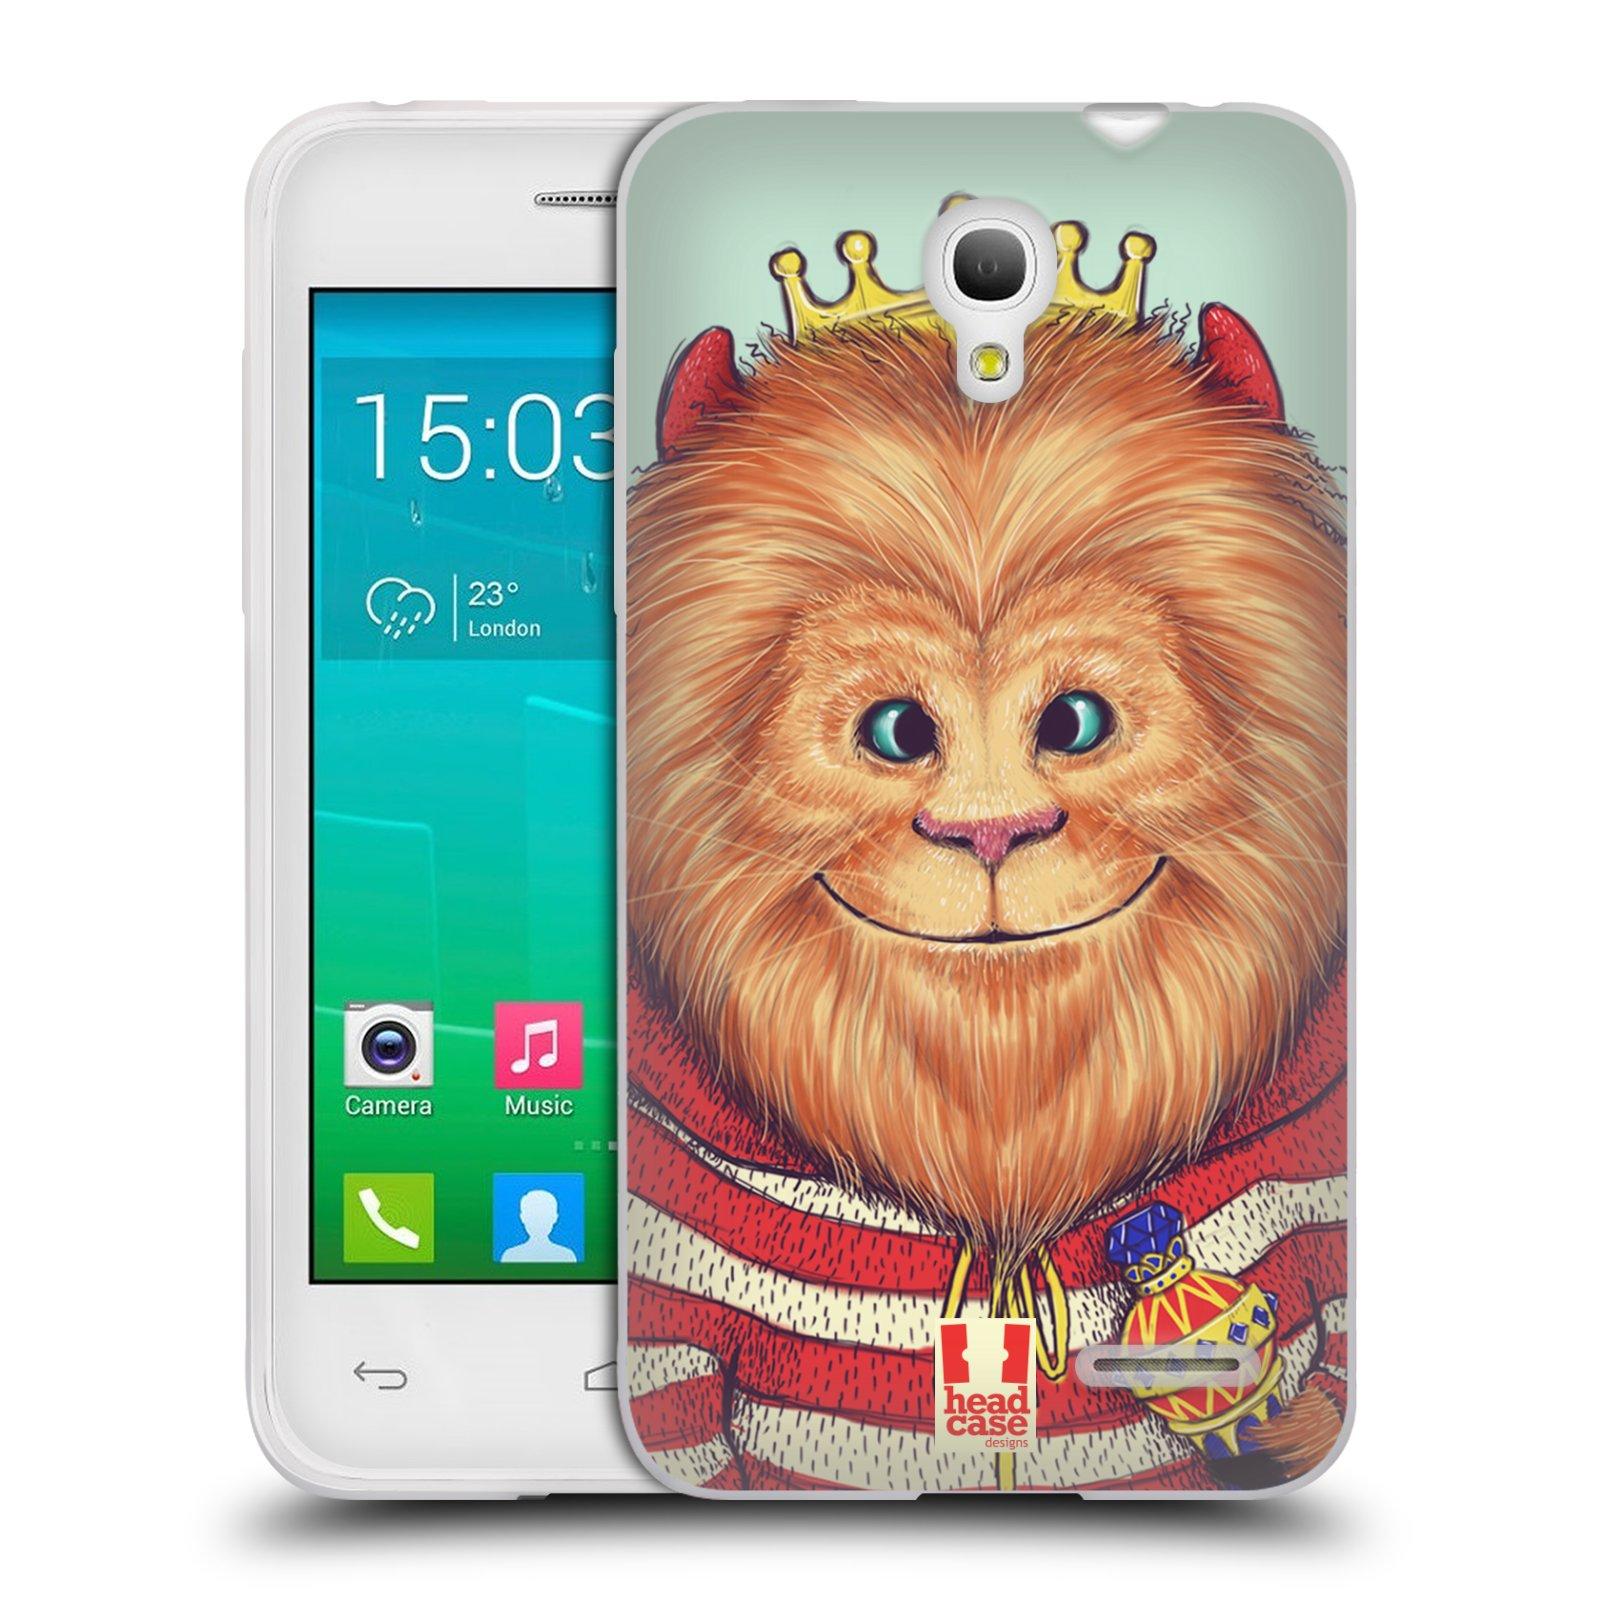 HEAD CASE silikonový obal na mobil Alcatel POP S3 OT-5050Y vzor Kreslená zvířátka lev